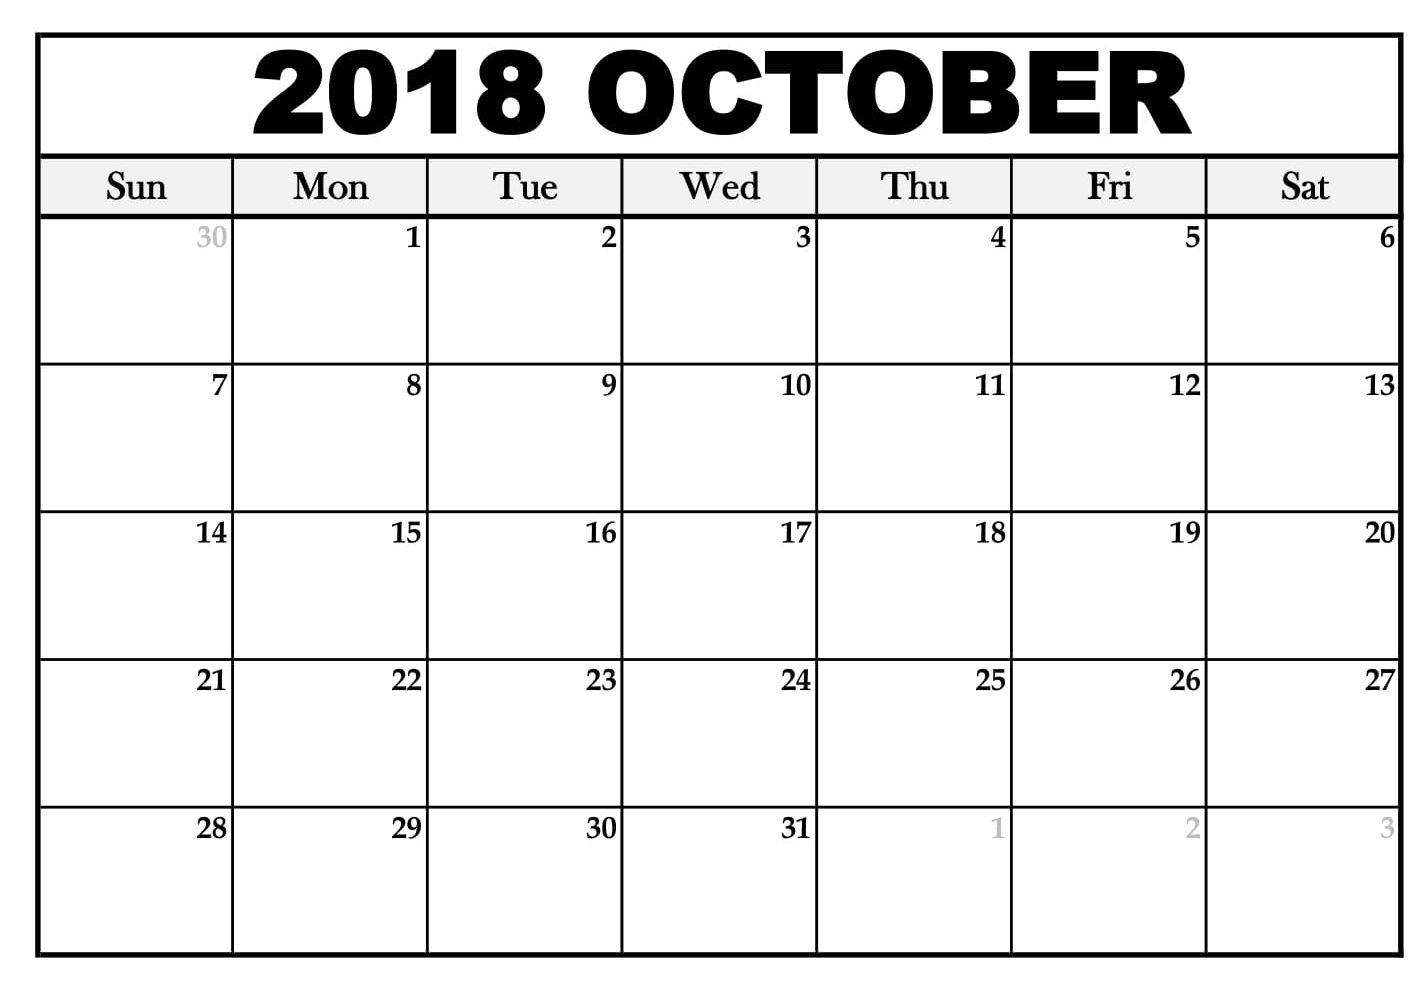 2018 October Weekly Calendar Printable Calendar October